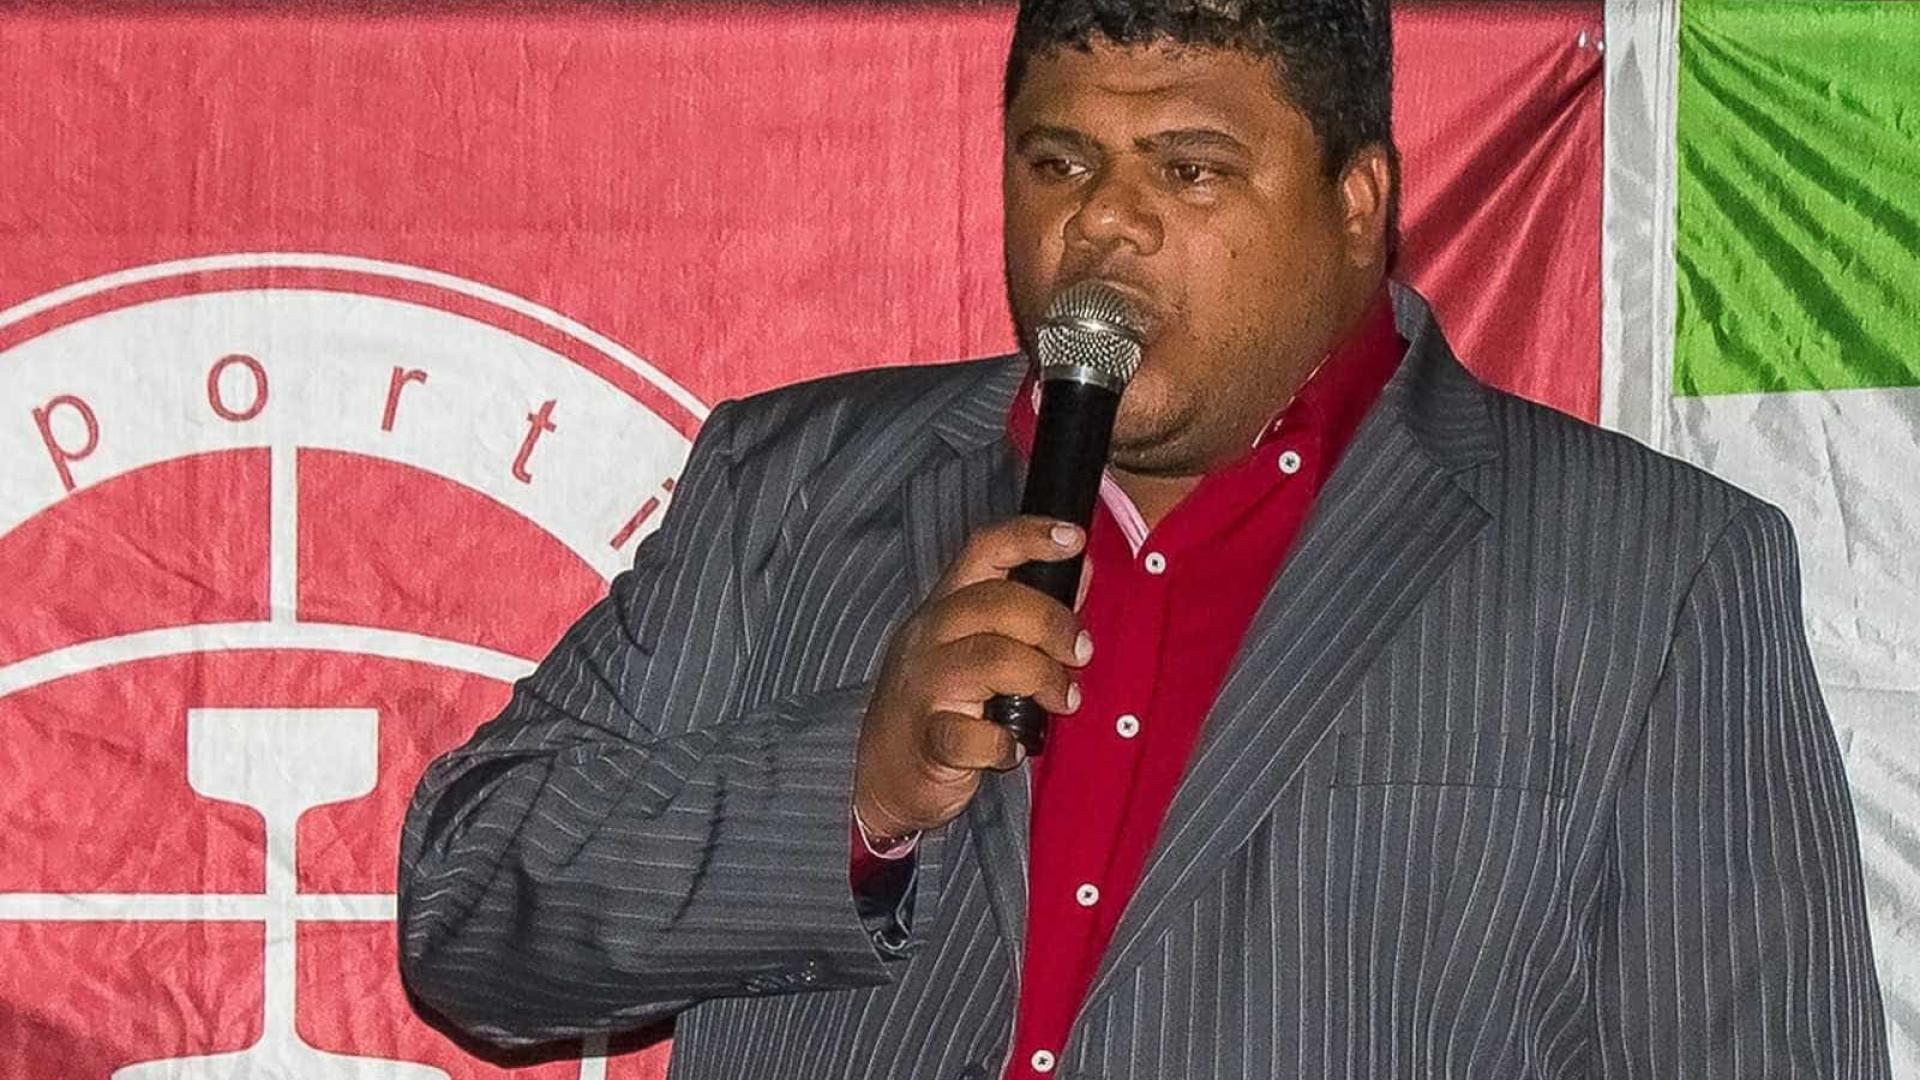 Presidente de clube brasileiro é preso pela PF por tráfico de drogas